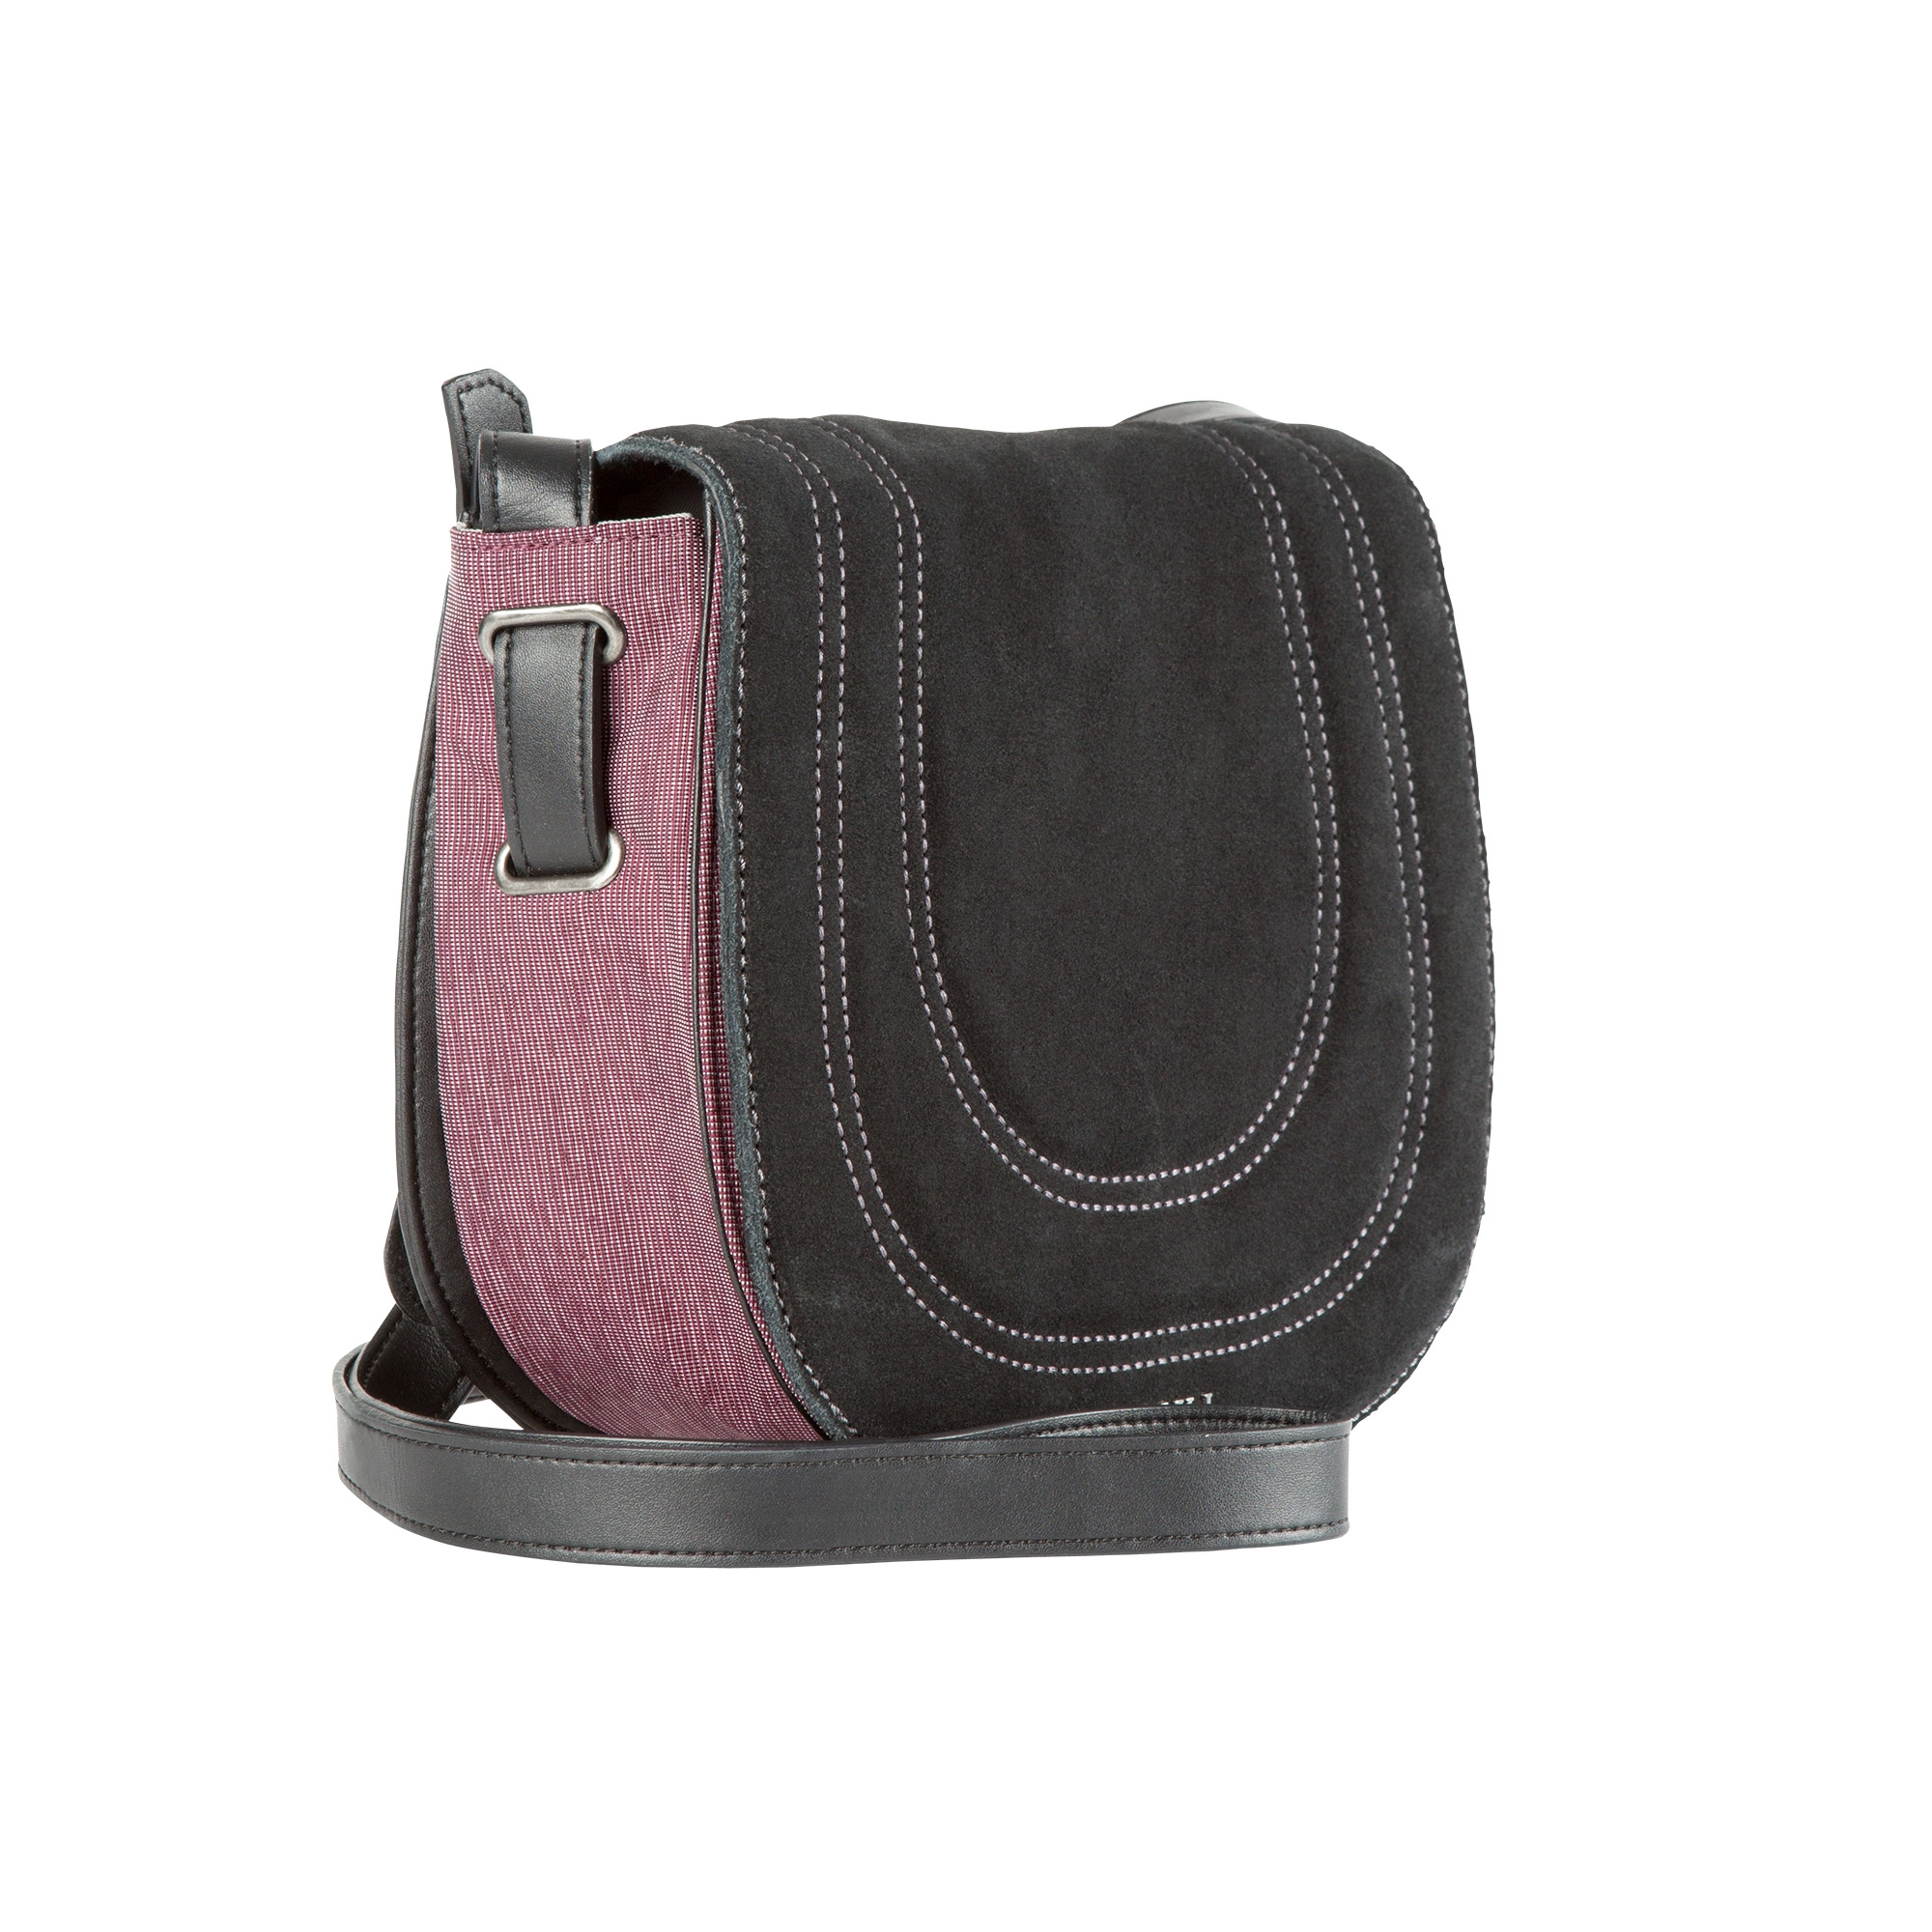 5.11 Tactical Women's Alice Saddle Bag (Black)